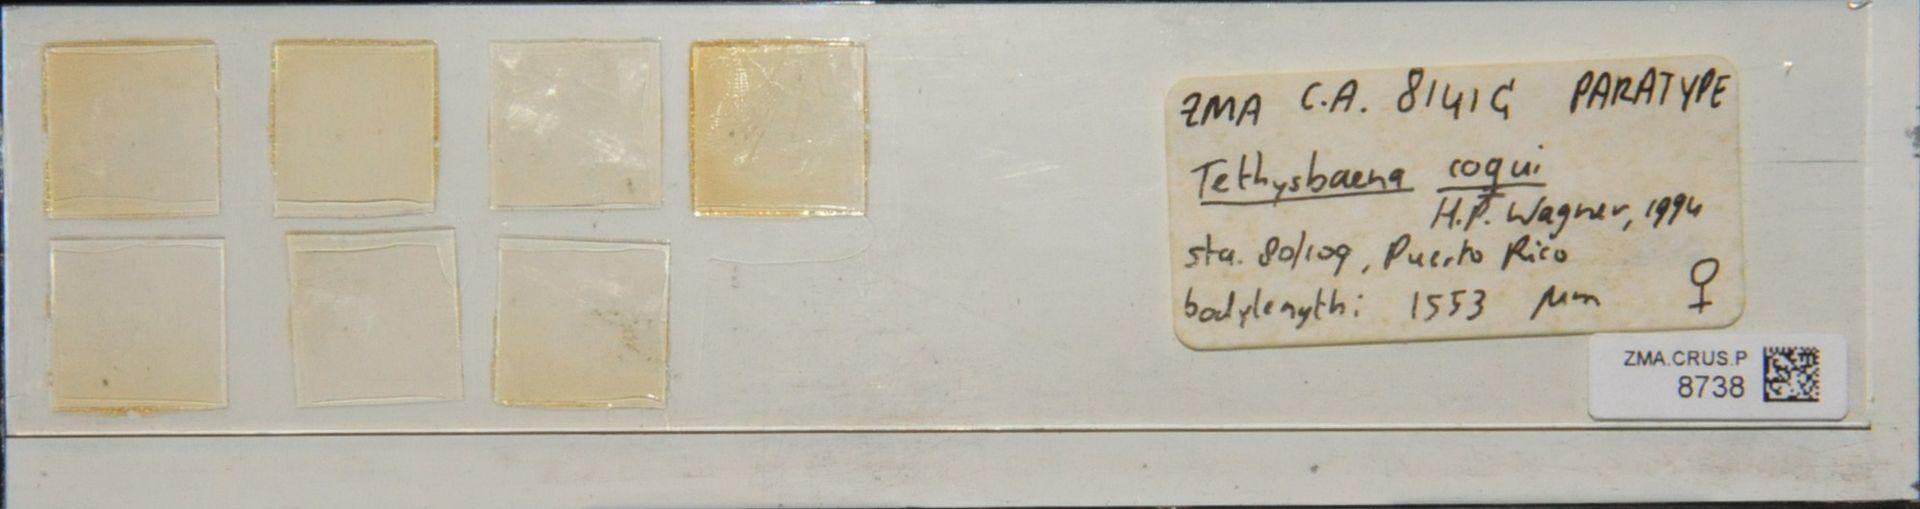 ZMA.CRUS.P.8738 | Tethysbaena coqui H.P. Wagner, 1994